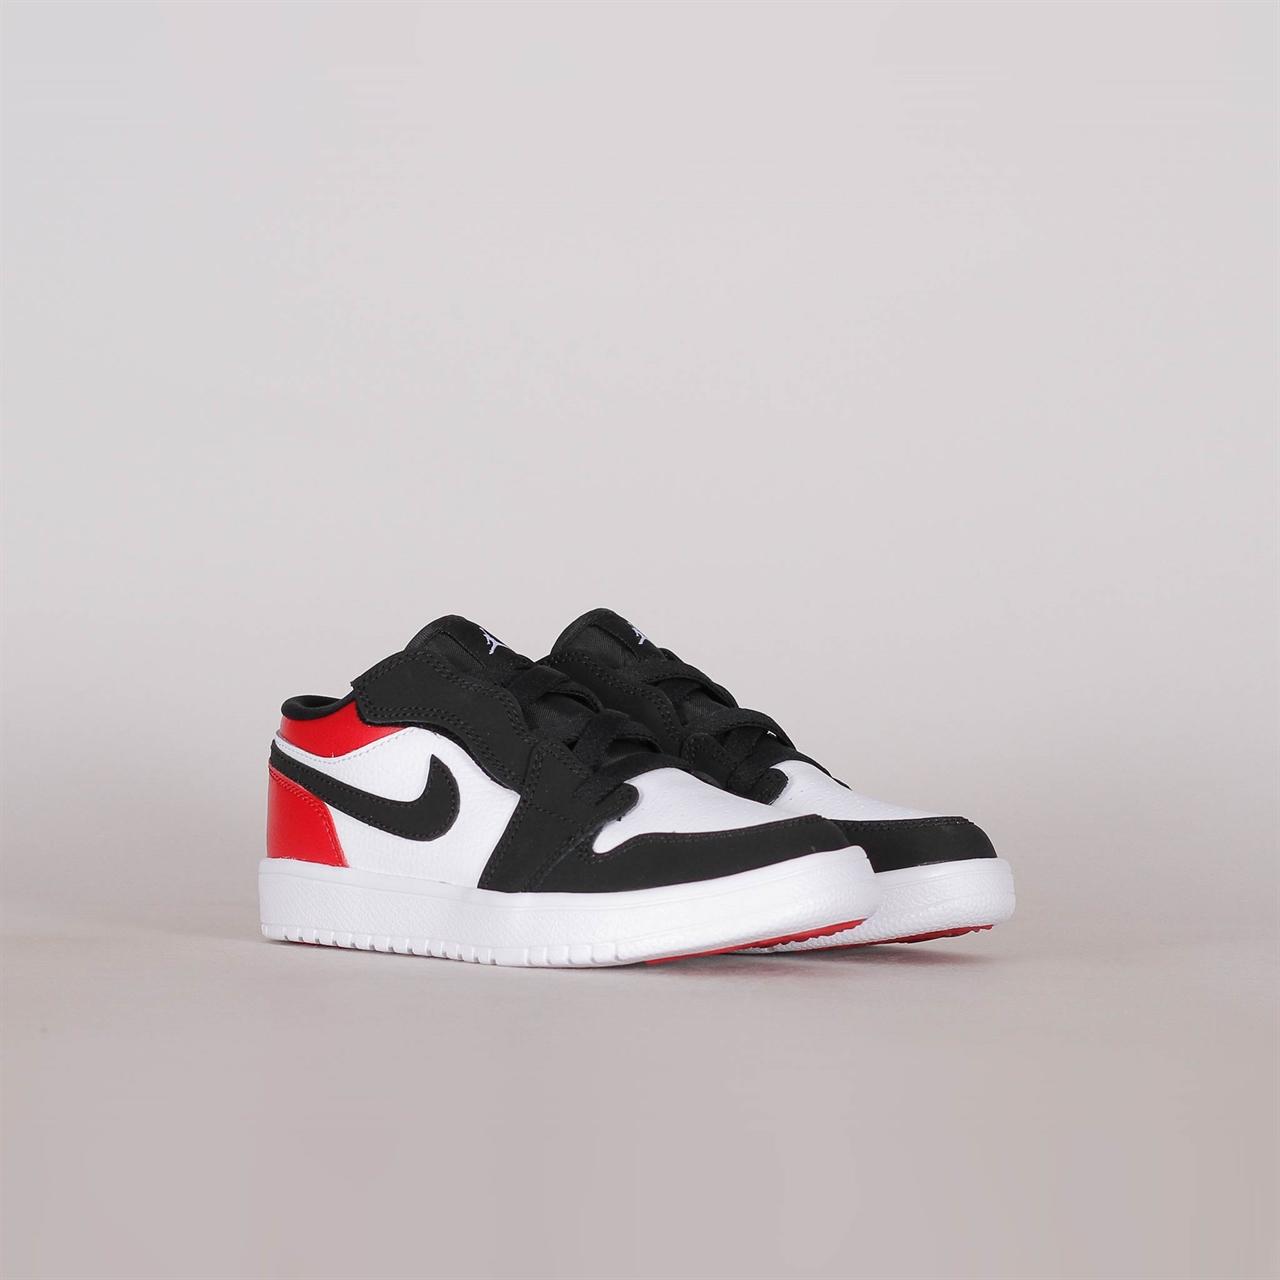 2d47b7ec41656 Nike Air Jordan 1 Low Pre-School Black Toe (BQ6066-116) - Shelta